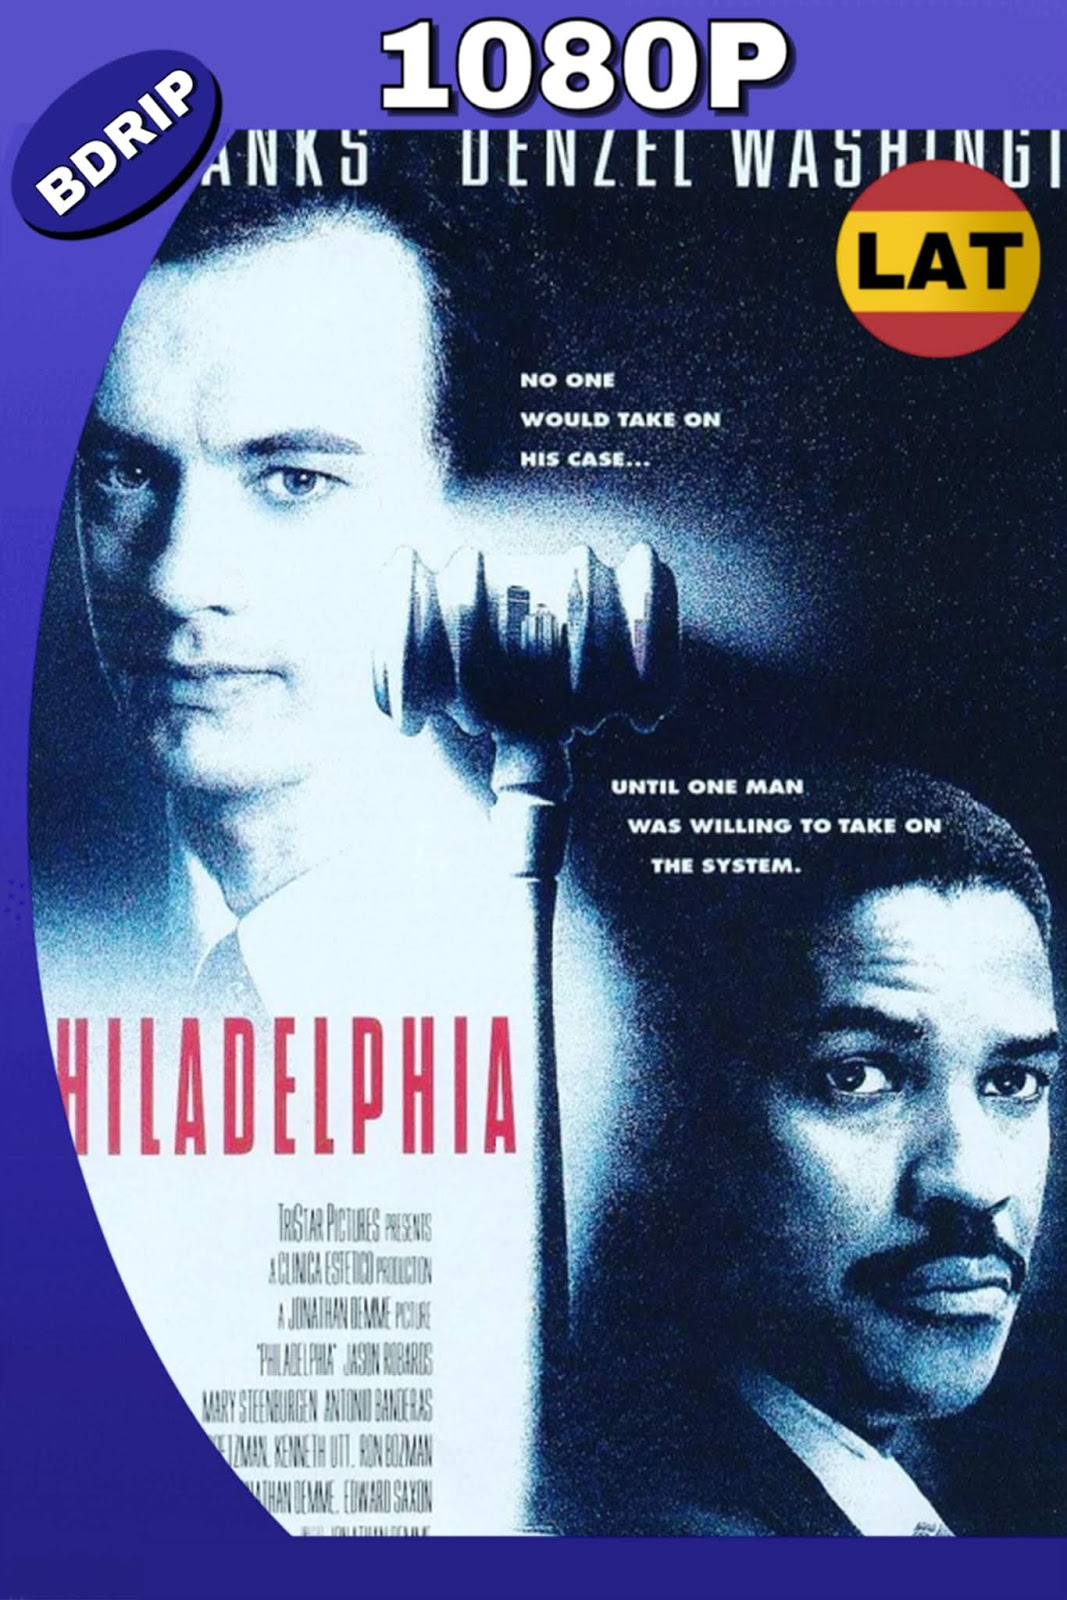 PHILADELPHIA 1993 LAT-ING FULL 1080P 8GB.mkv